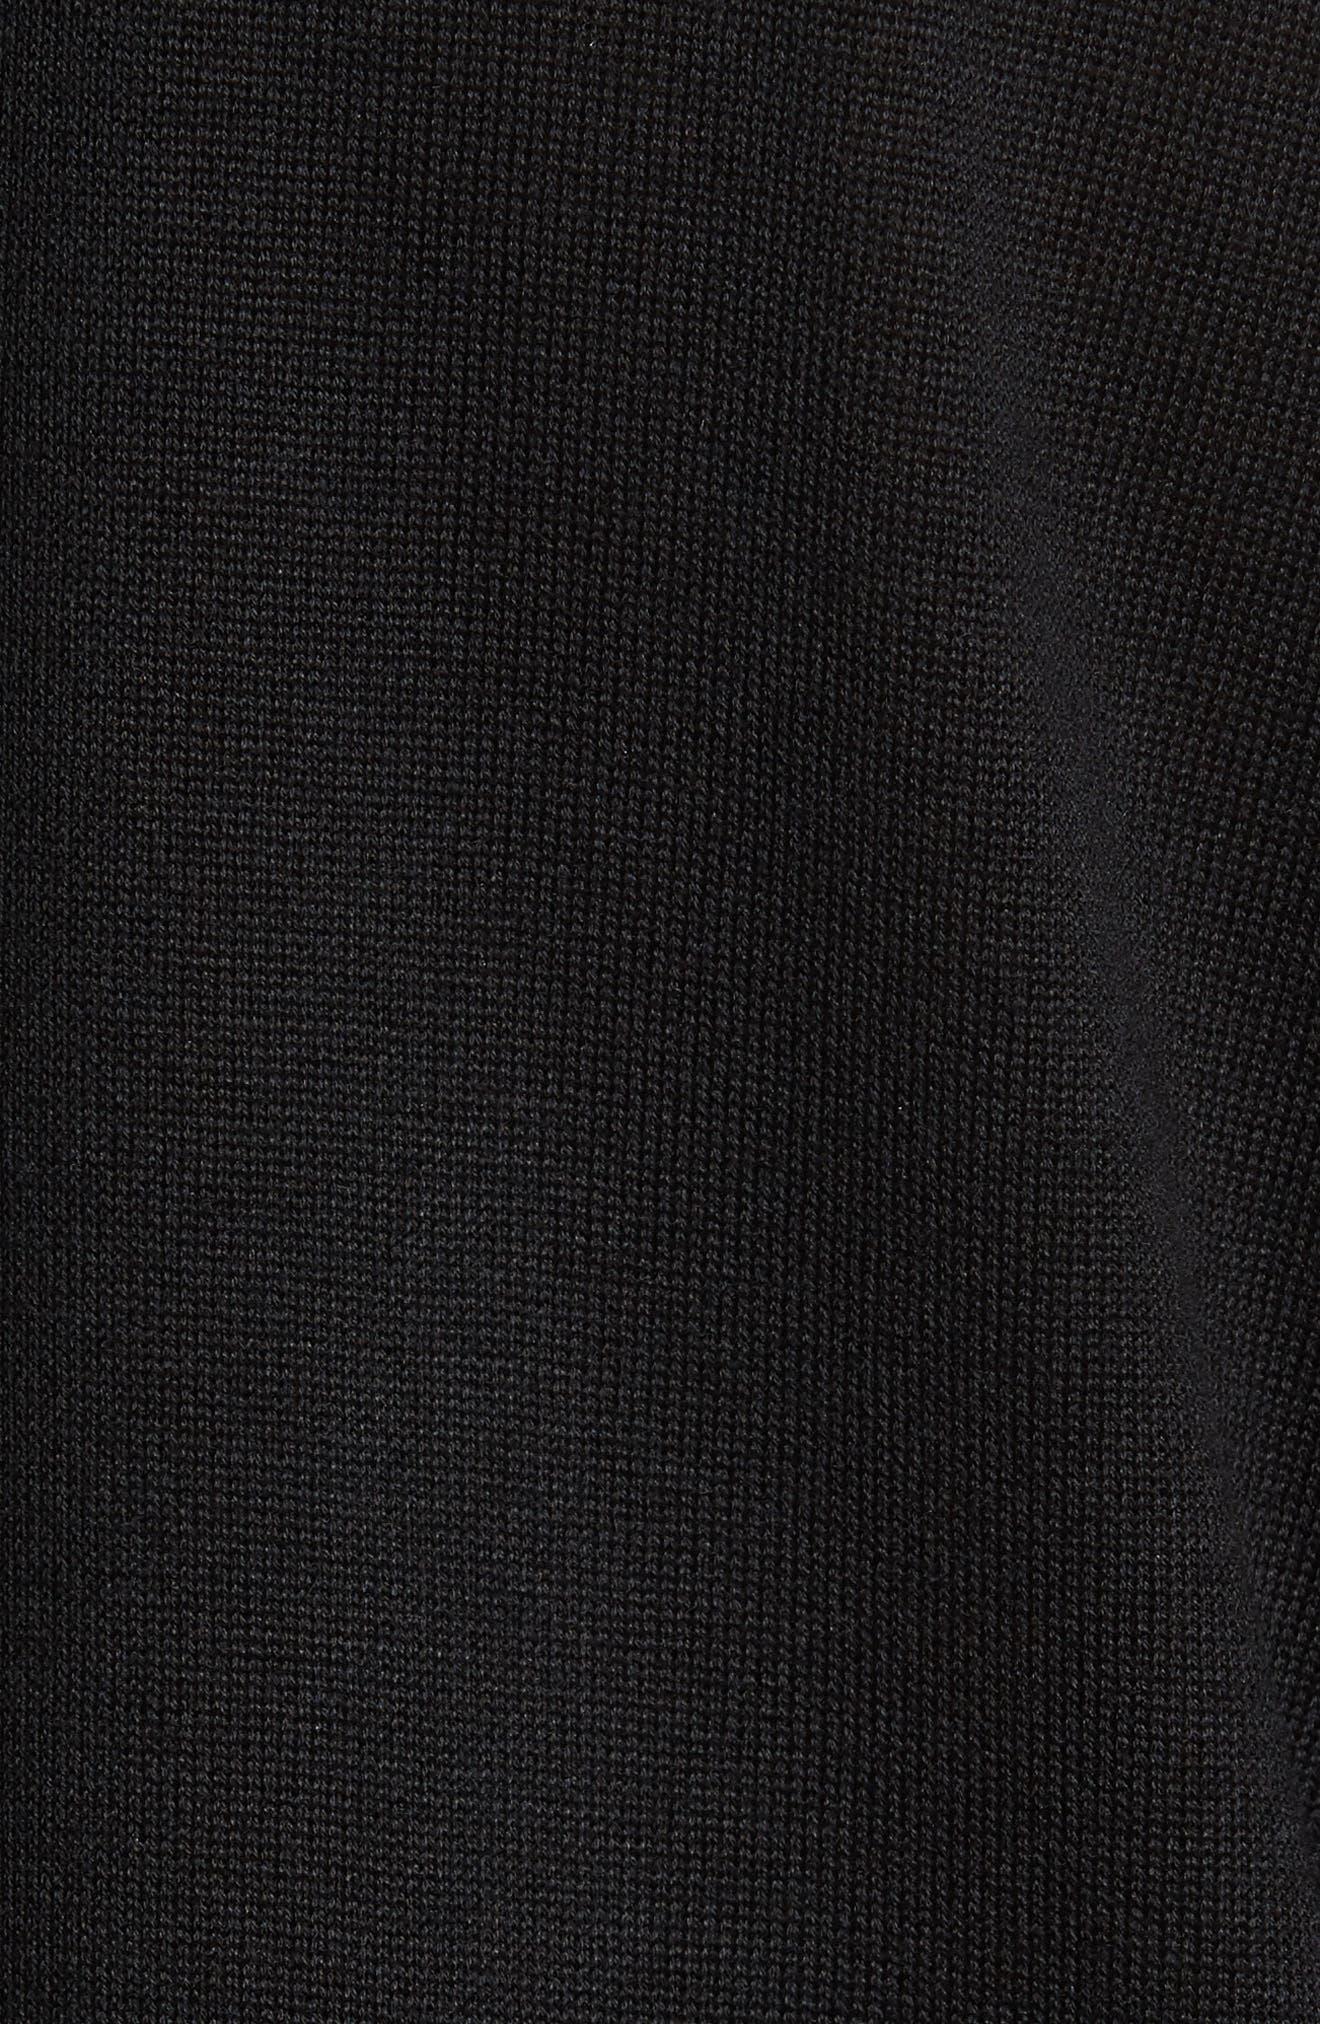 Alternate Image 5  - Ming Wang Lace & Knit Top